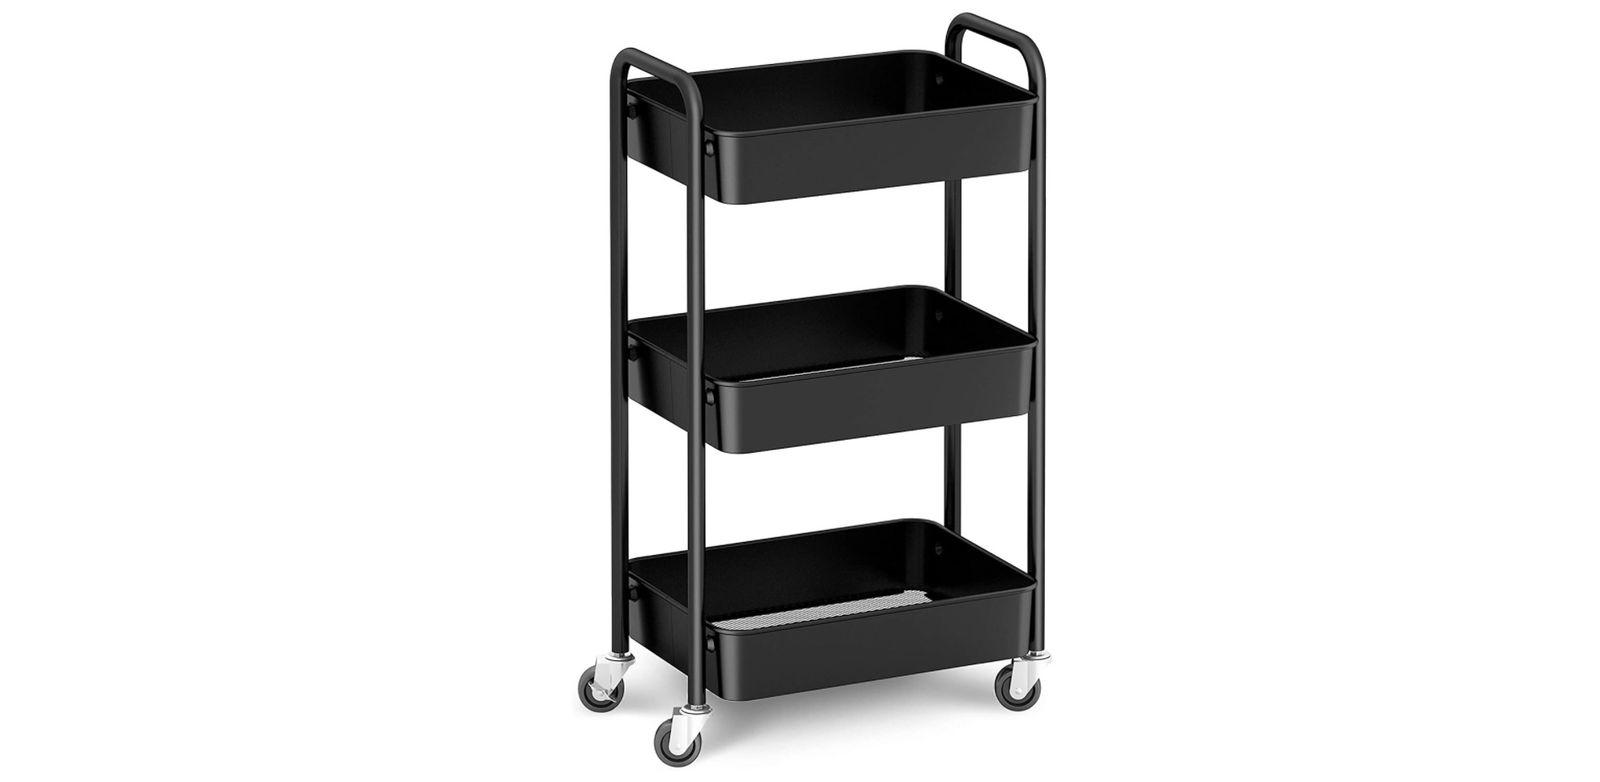 CAXXA 3-Tier Rolling Metal Storage Organizer - best bike storage